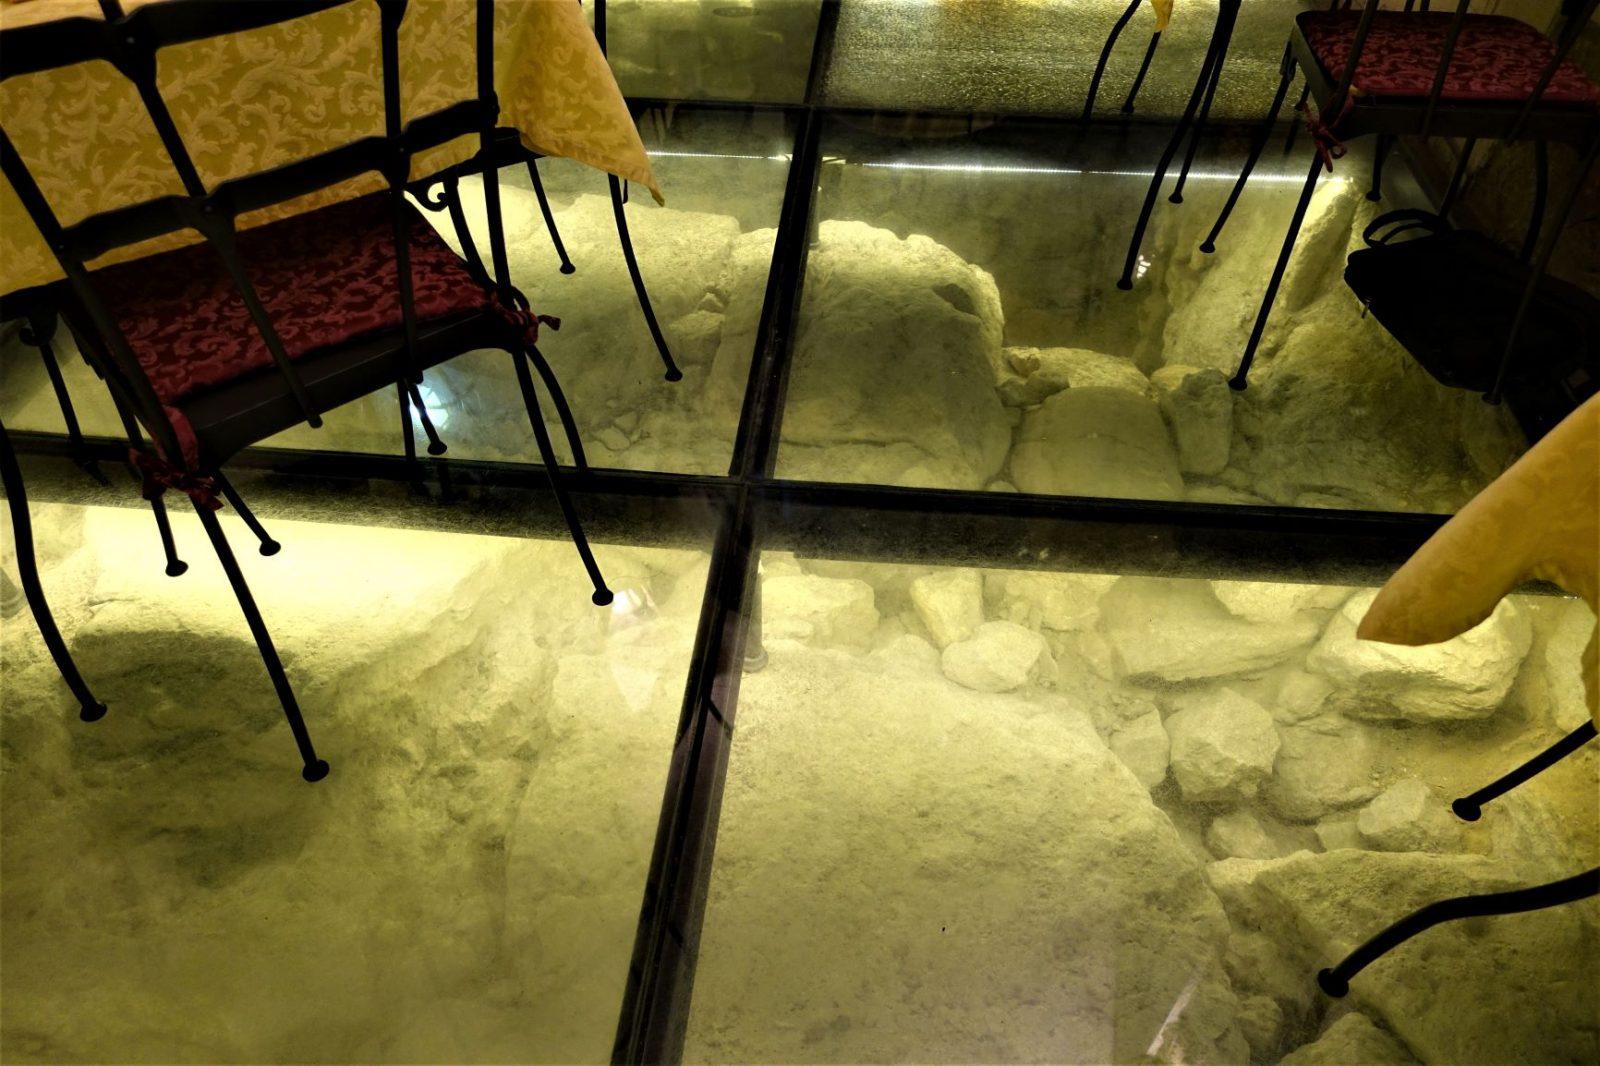 utgravninger i Toscana under gulvet i en restaurant